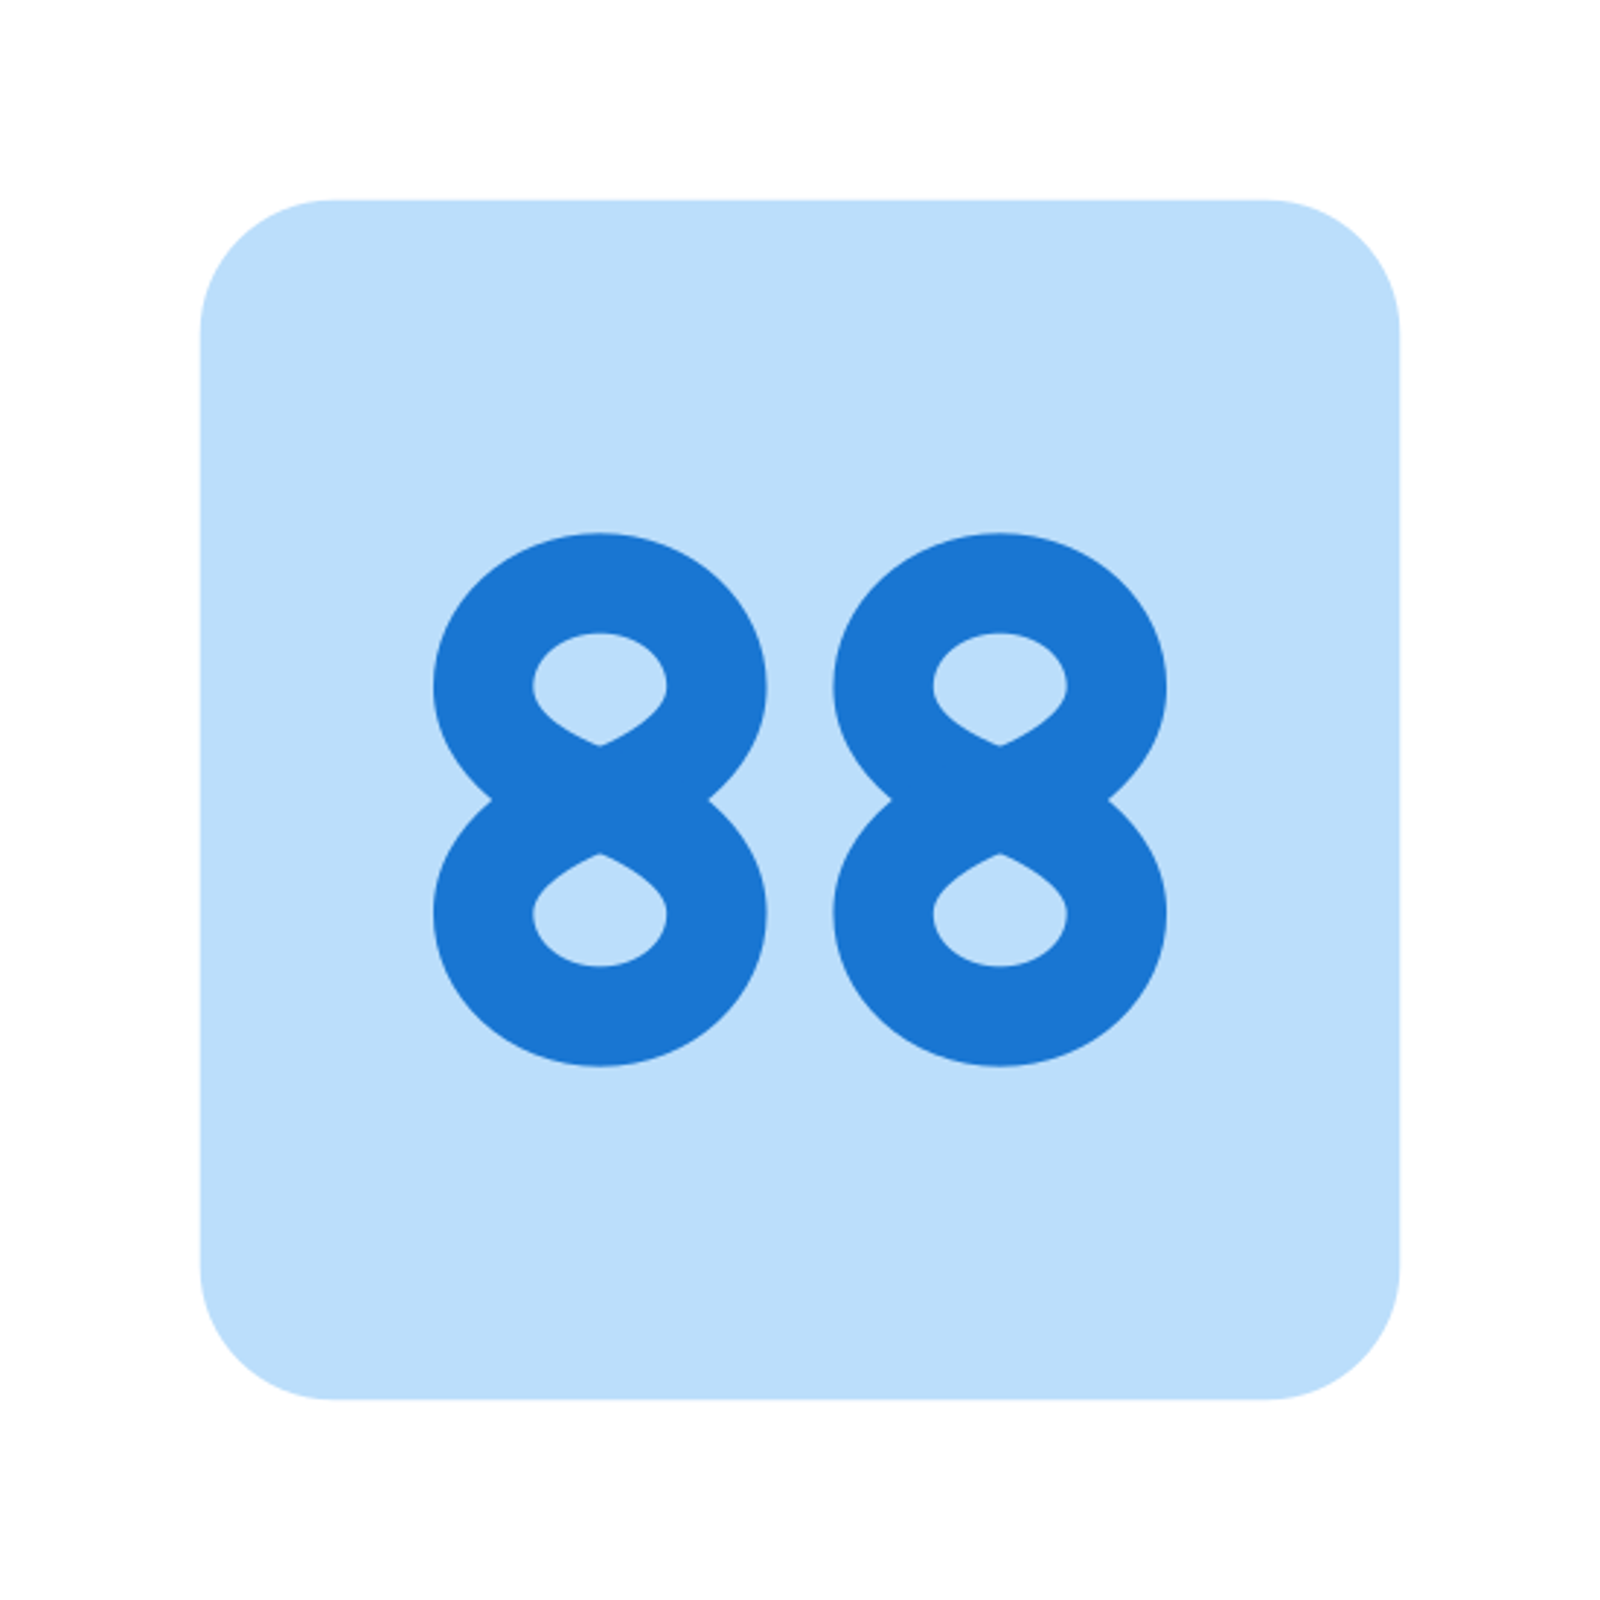 88 icon